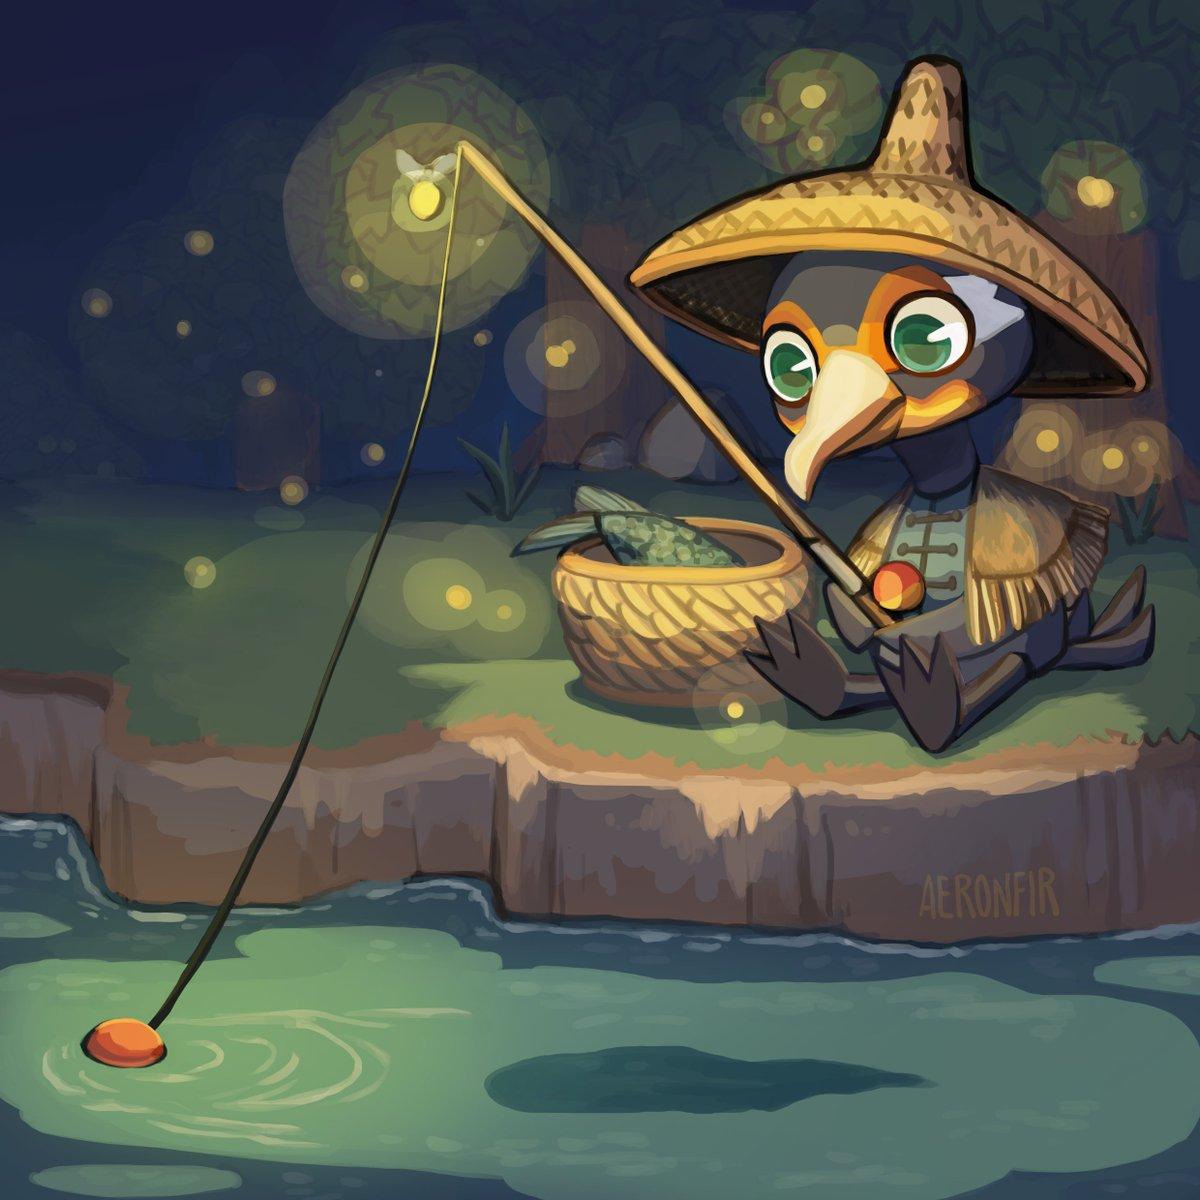 RT @Aeronfir: Cormorant fishing 🐟🌉  #AnimalCrossingPocketCamp #CharacterDesignChallenge https://t.co/pjuHFOh3t6